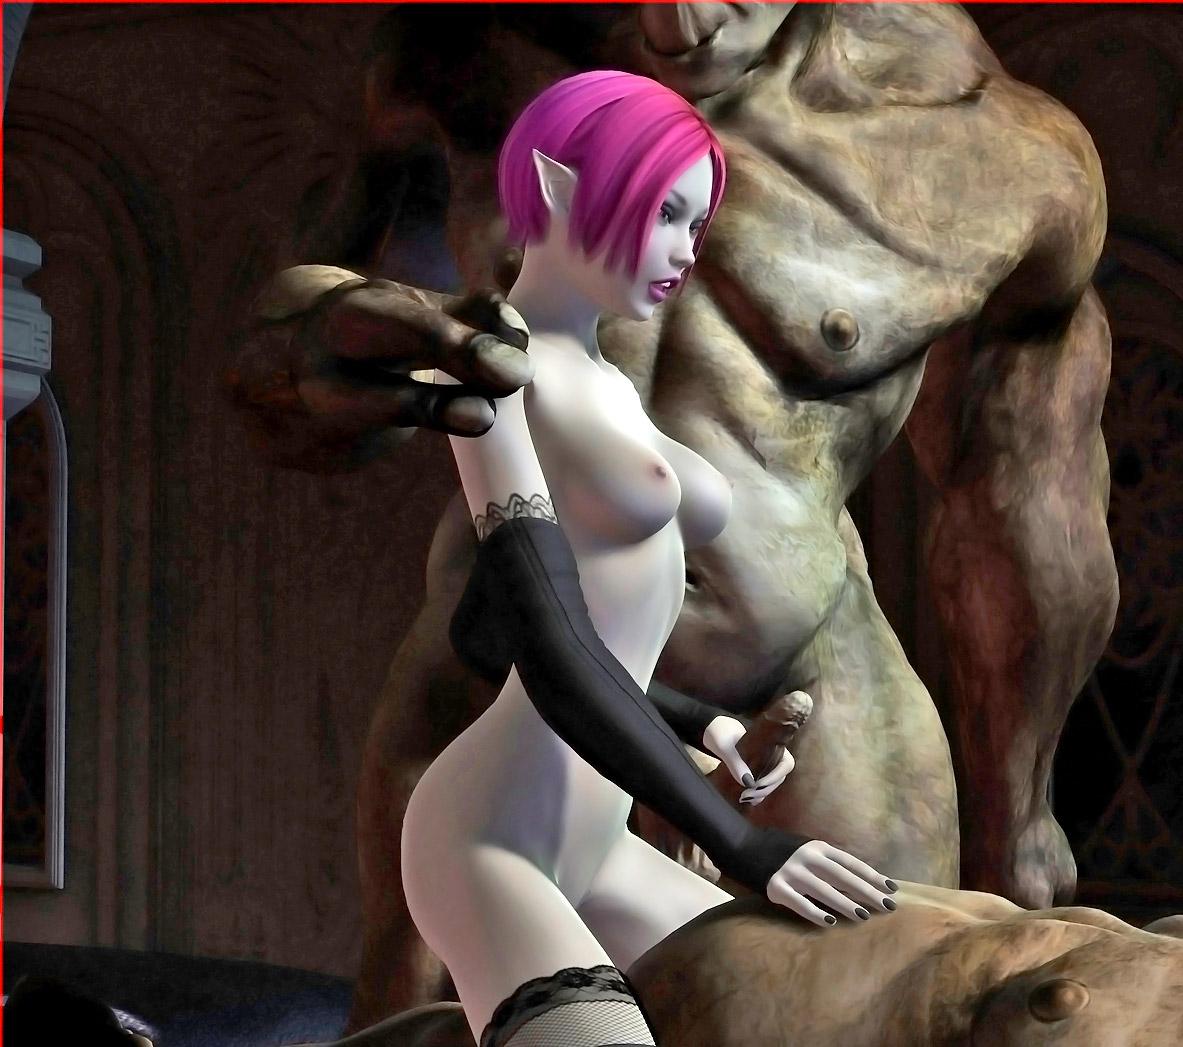 Komik goblin porno erotic scenes